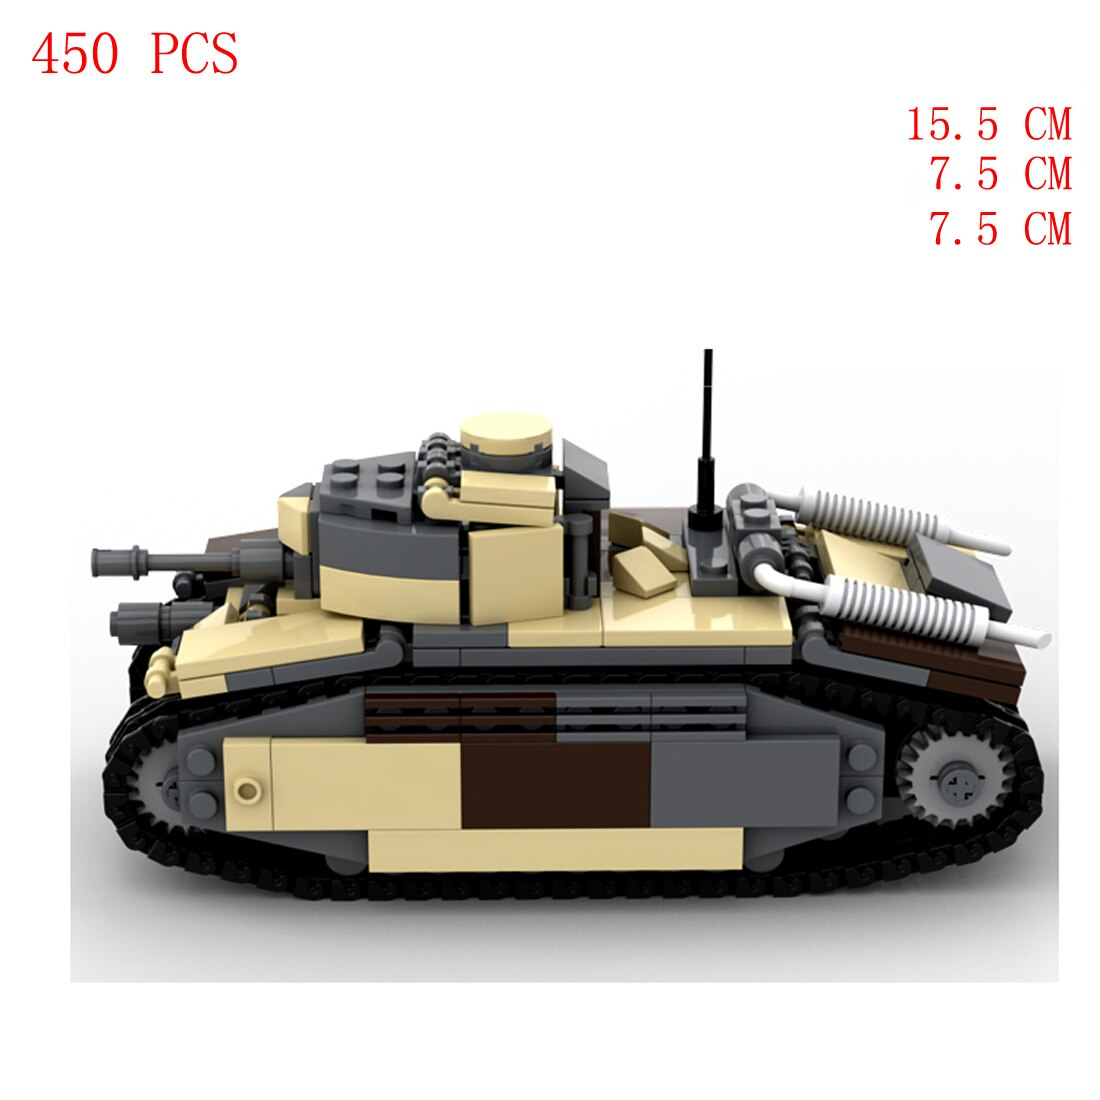 Купить с кэшбэком hot military WWII French Army technics vehicles char b1 heavy tank equipment weapons Building Blocks model bricks toys for gift